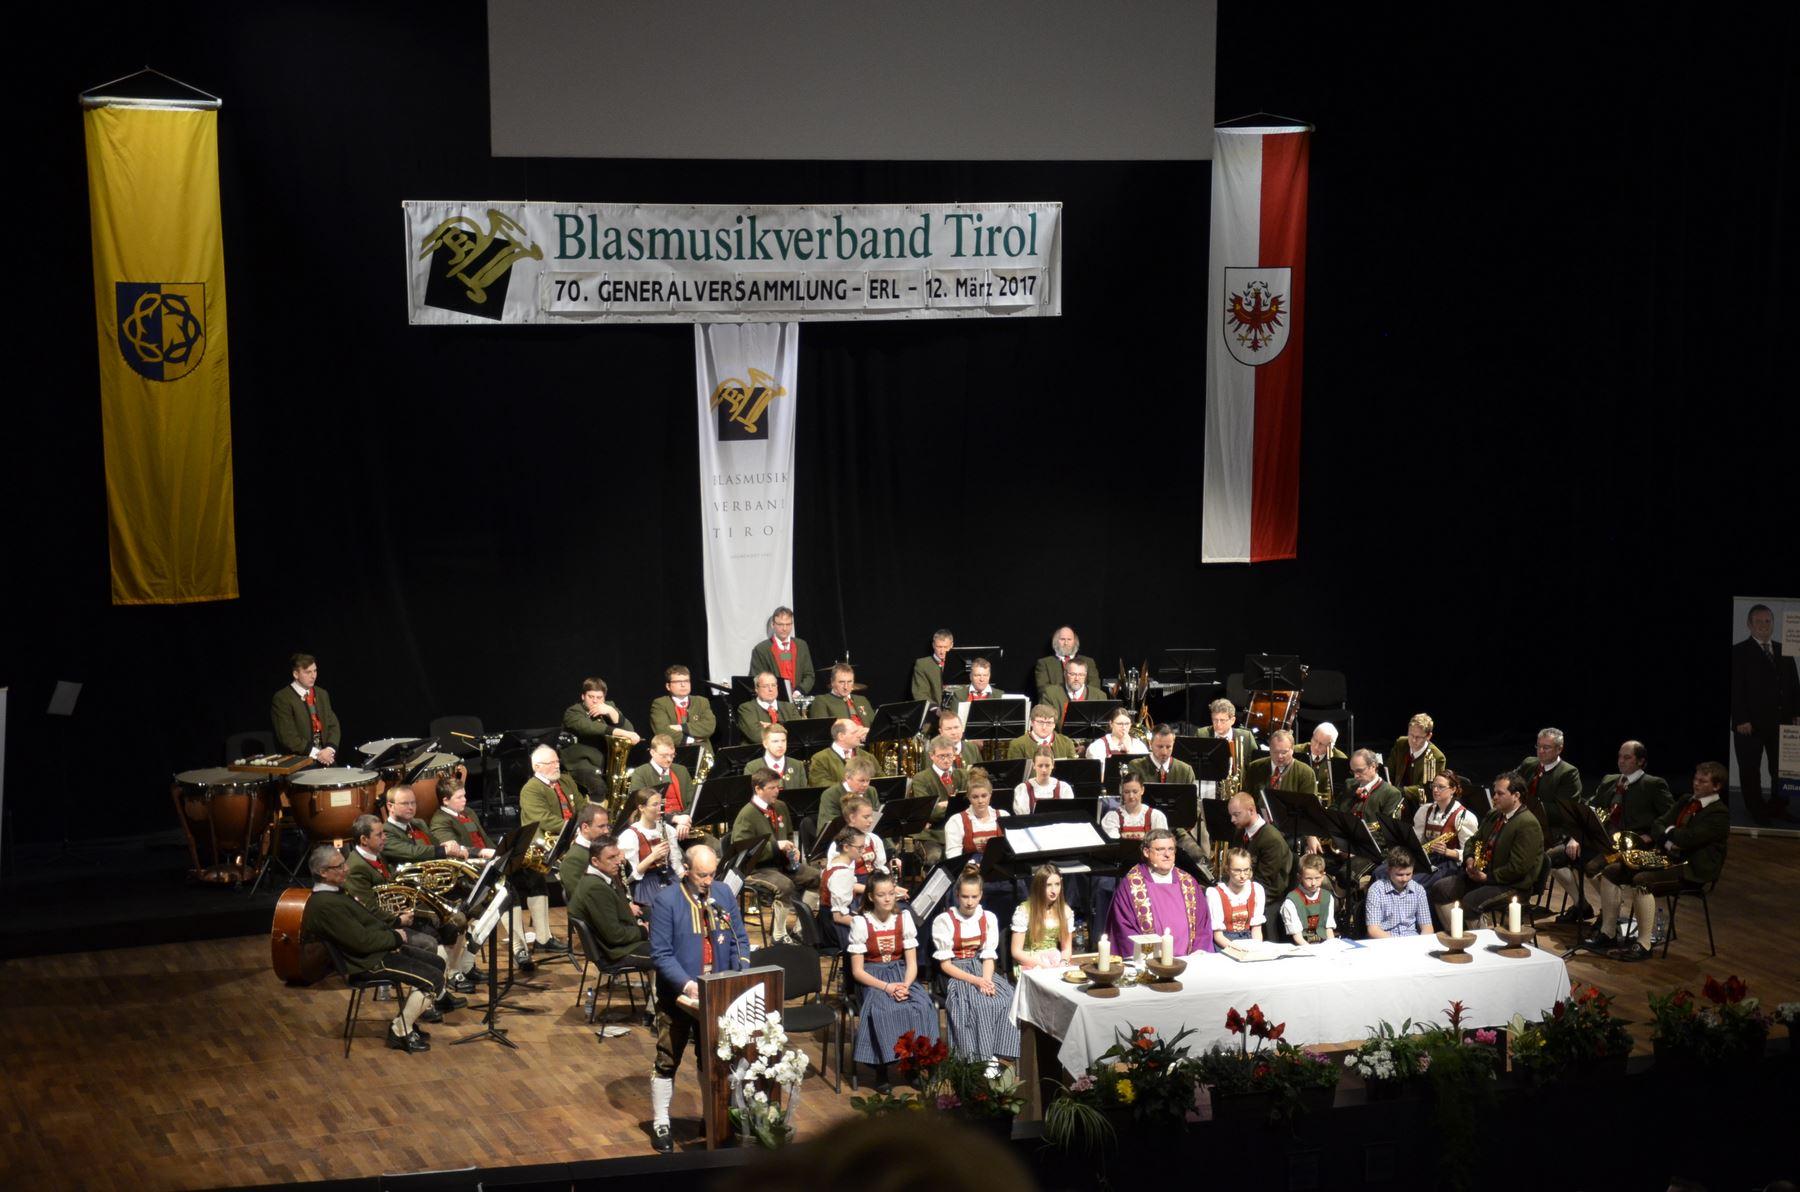 2017-03-12 Landesverbandsitzung Erl 002